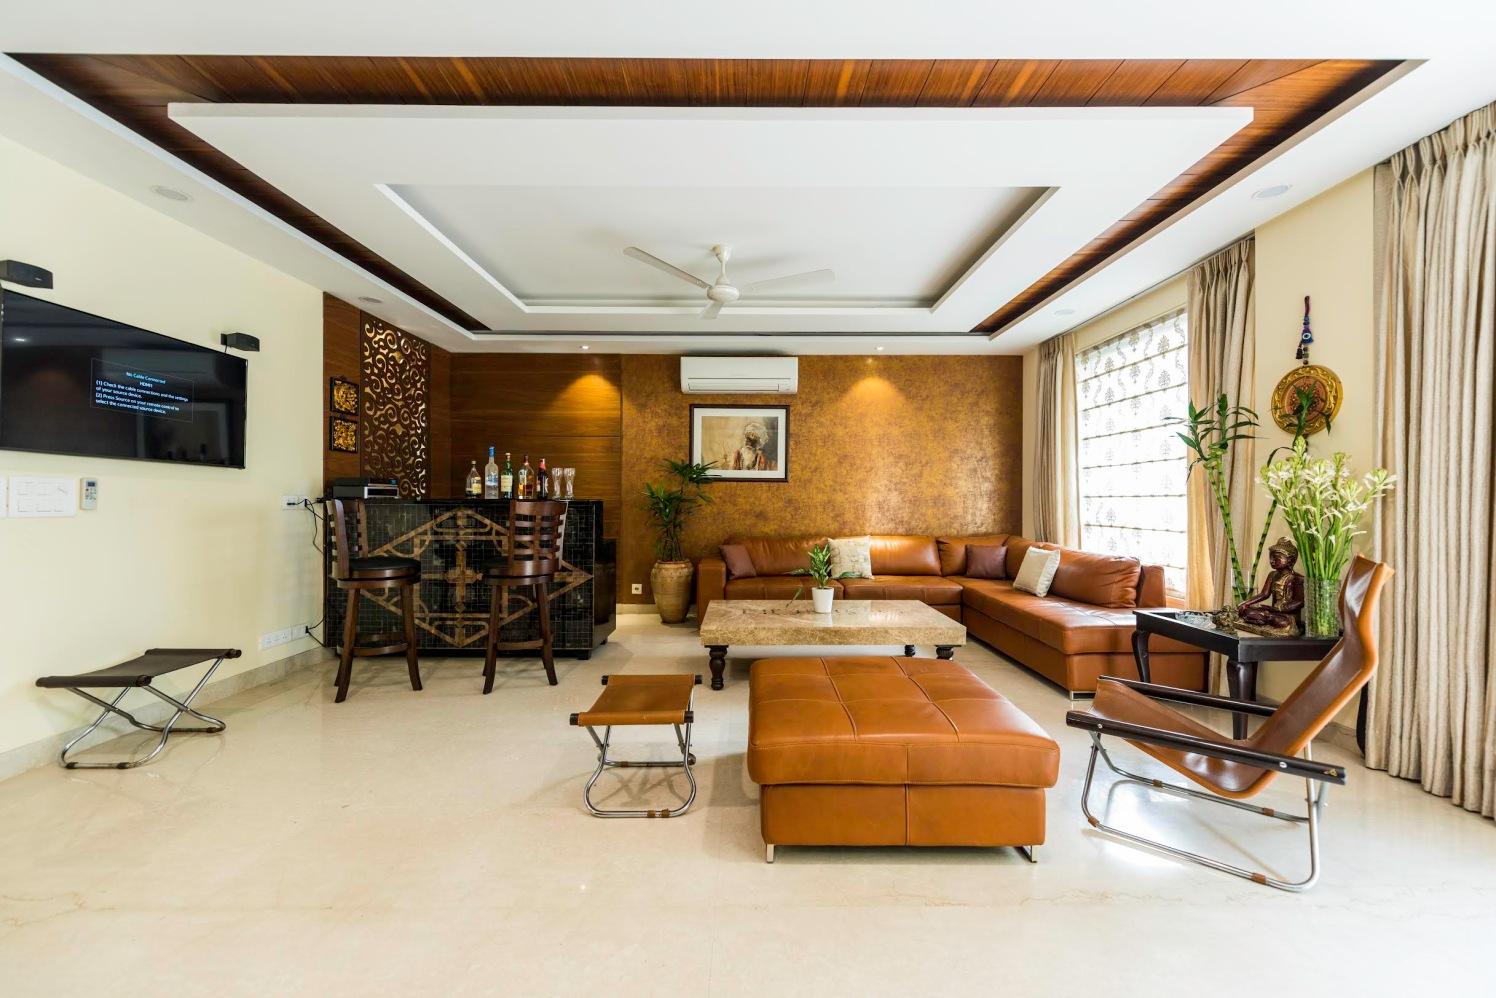 Living Room With Bulky Furniture by Vijay Kapur Living-room Contemporary   Interior Design Photos & Ideas